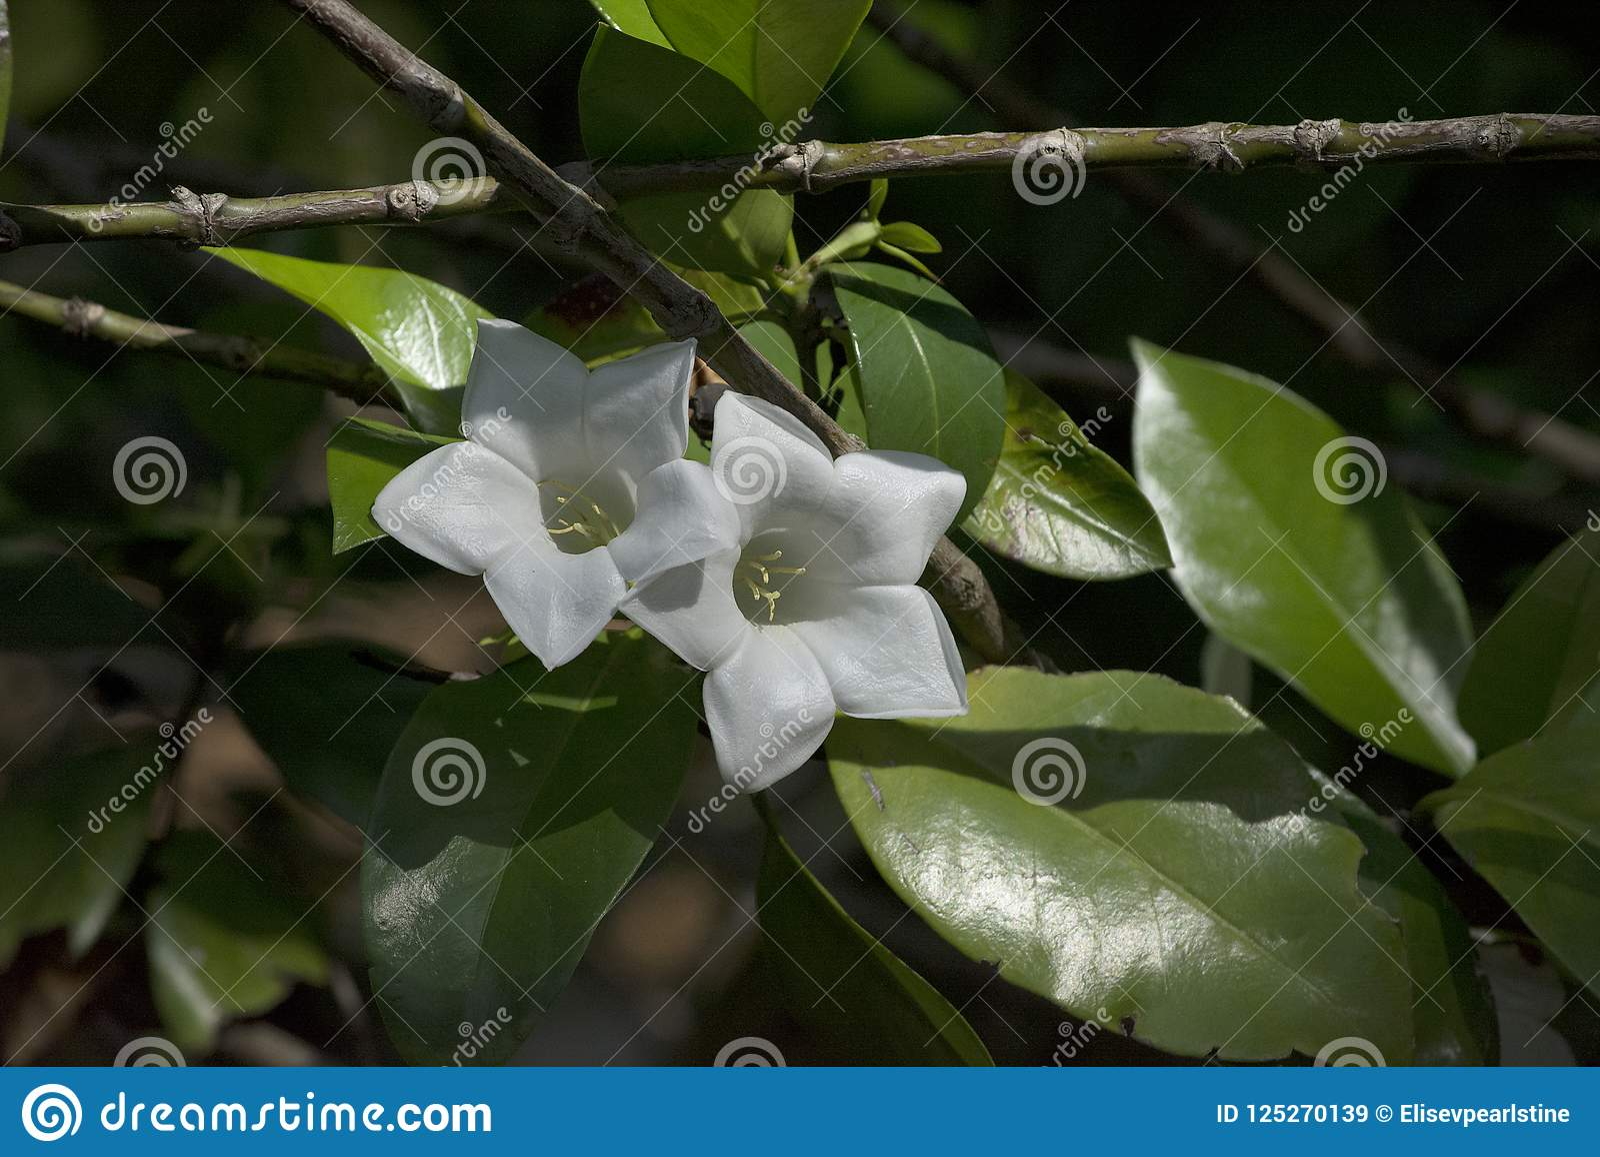 Large White Fragrant Flowers Of A Portlandia Platantha Shrub Stock